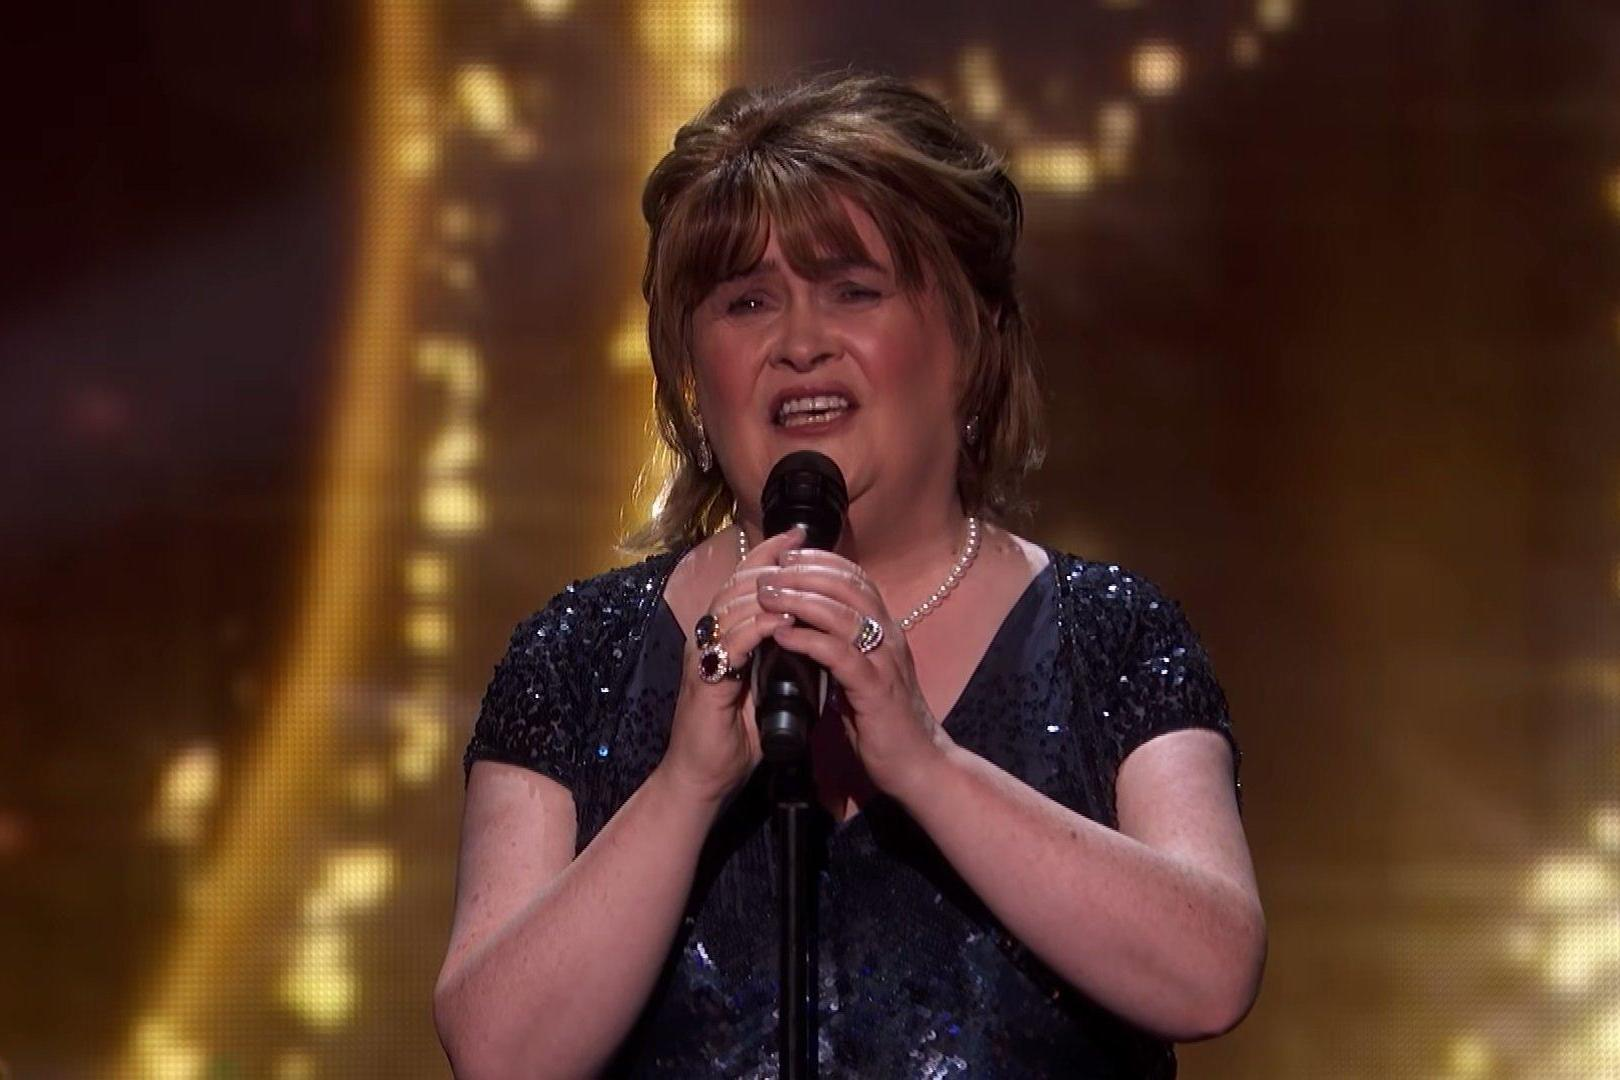 Susan Boyle wins Golden Buzzer on America's Got Talent: The